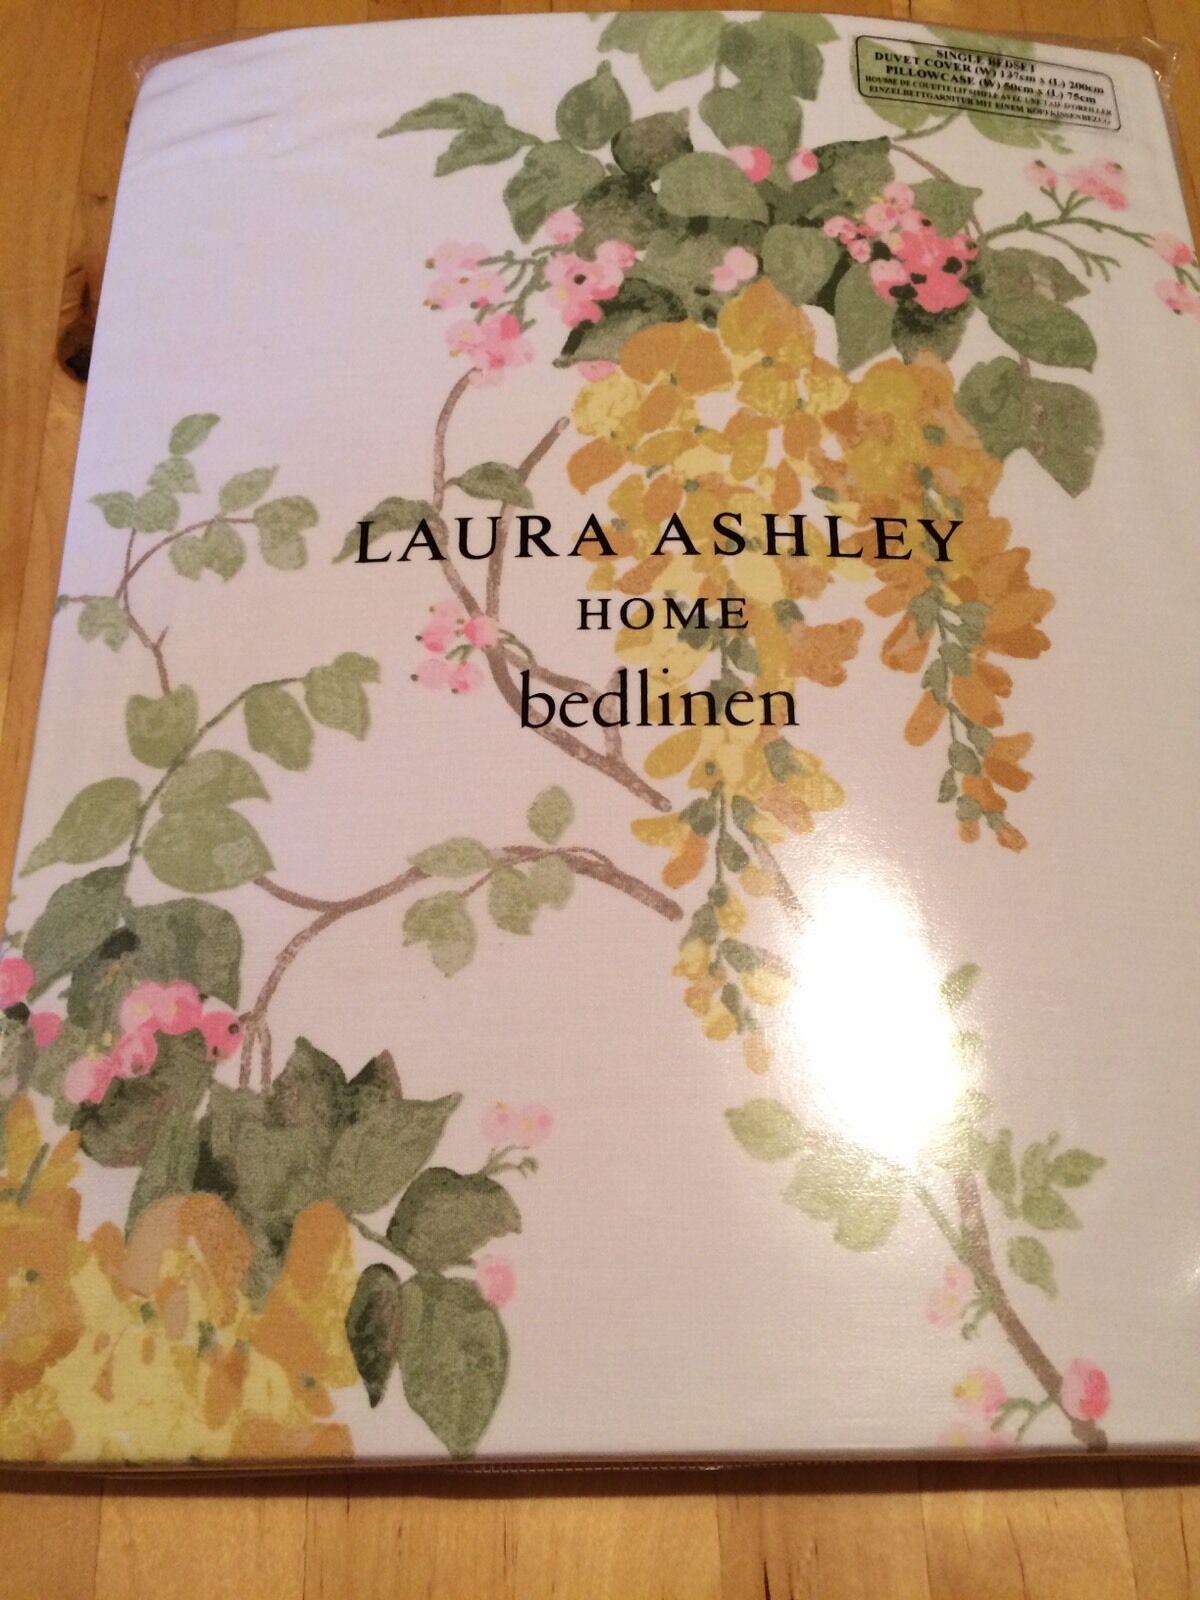 BNWT New Laura Ashley Single Bedset Cover 1 Pillowcase Wisteria Camomile Cotton